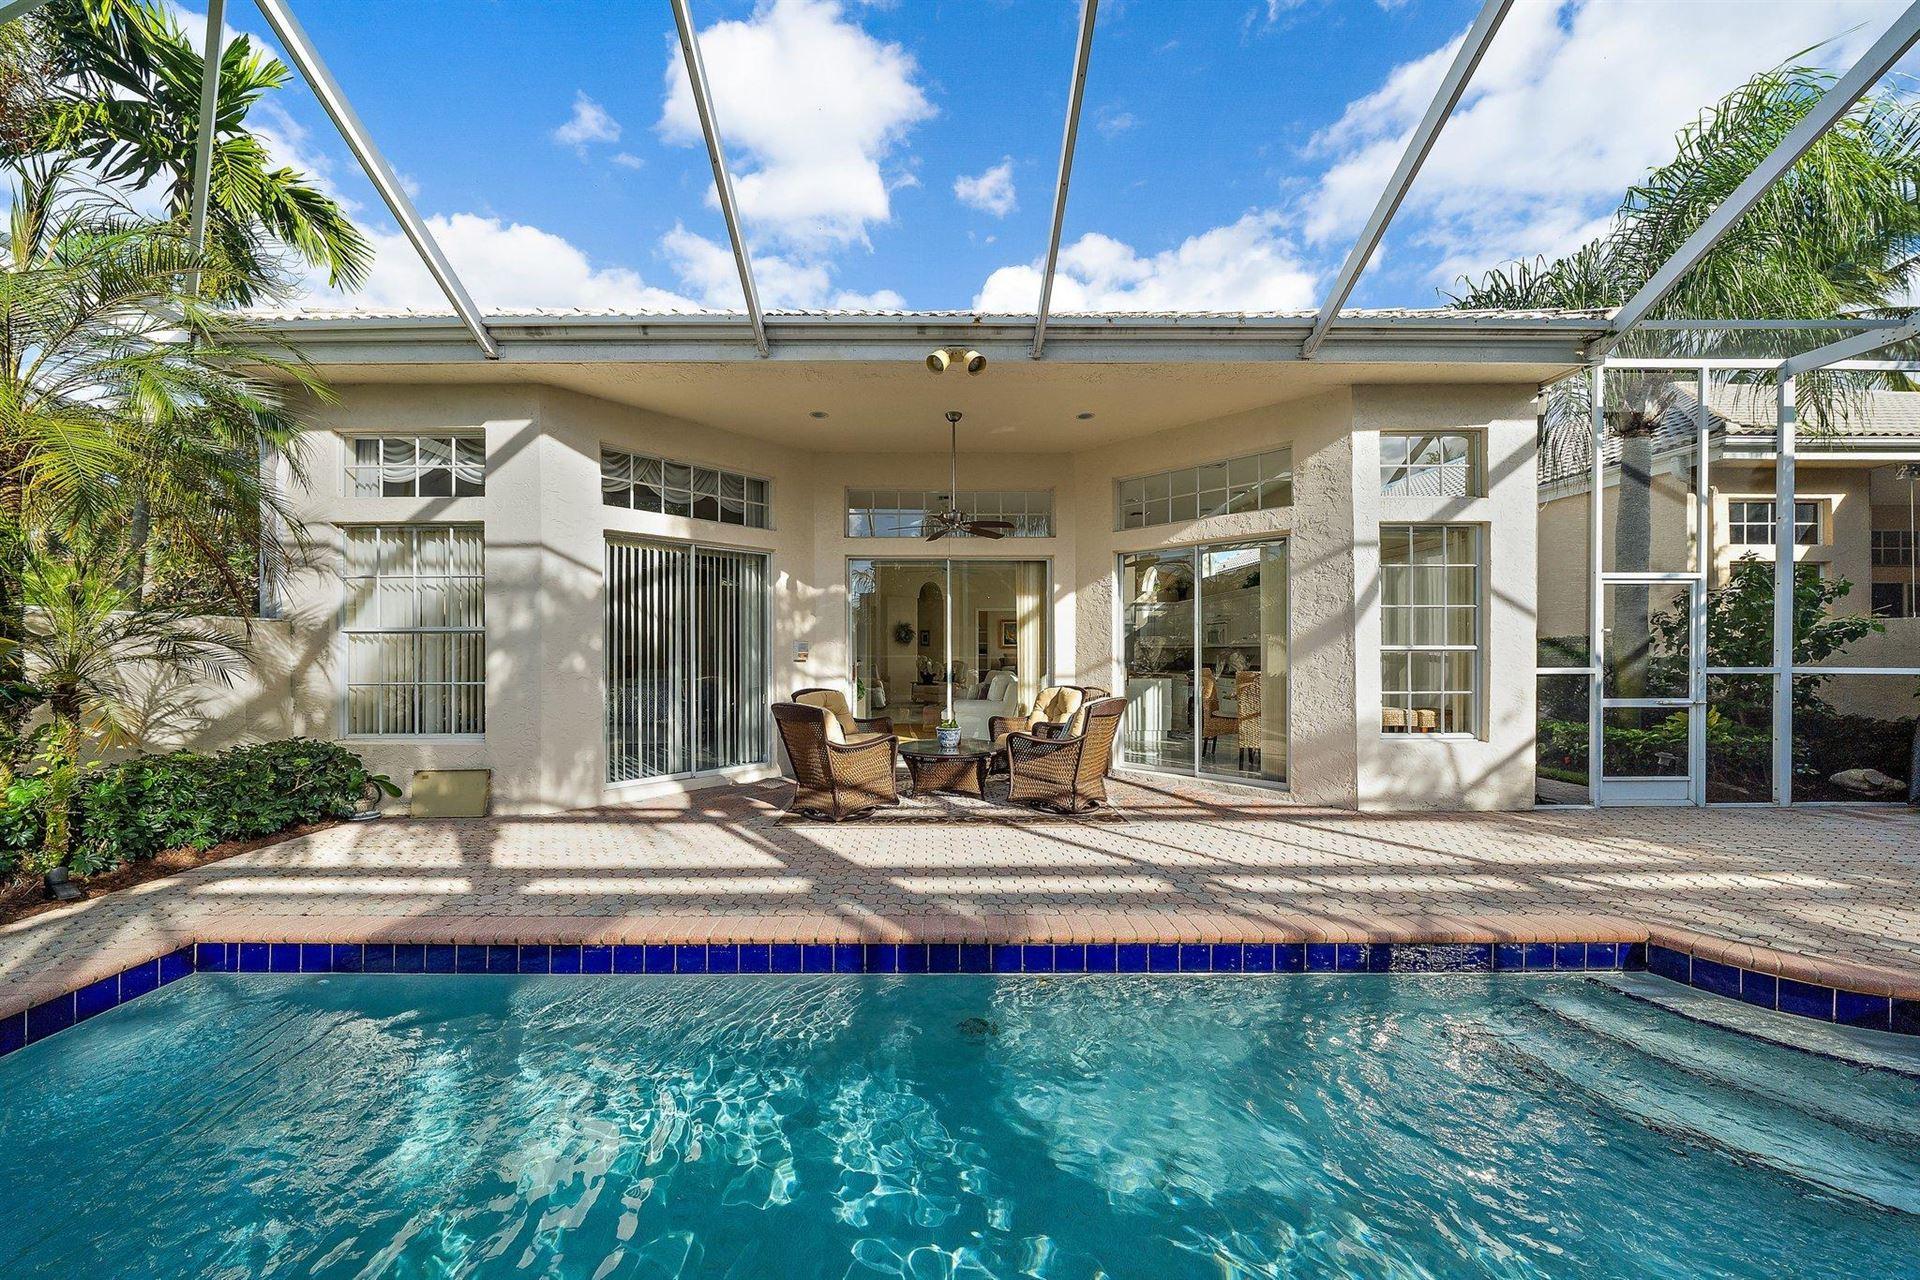 Photo of 205 Coral Cay Terrace, Palm Beach Gardens, FL 33418 (MLS # RX-10676359)